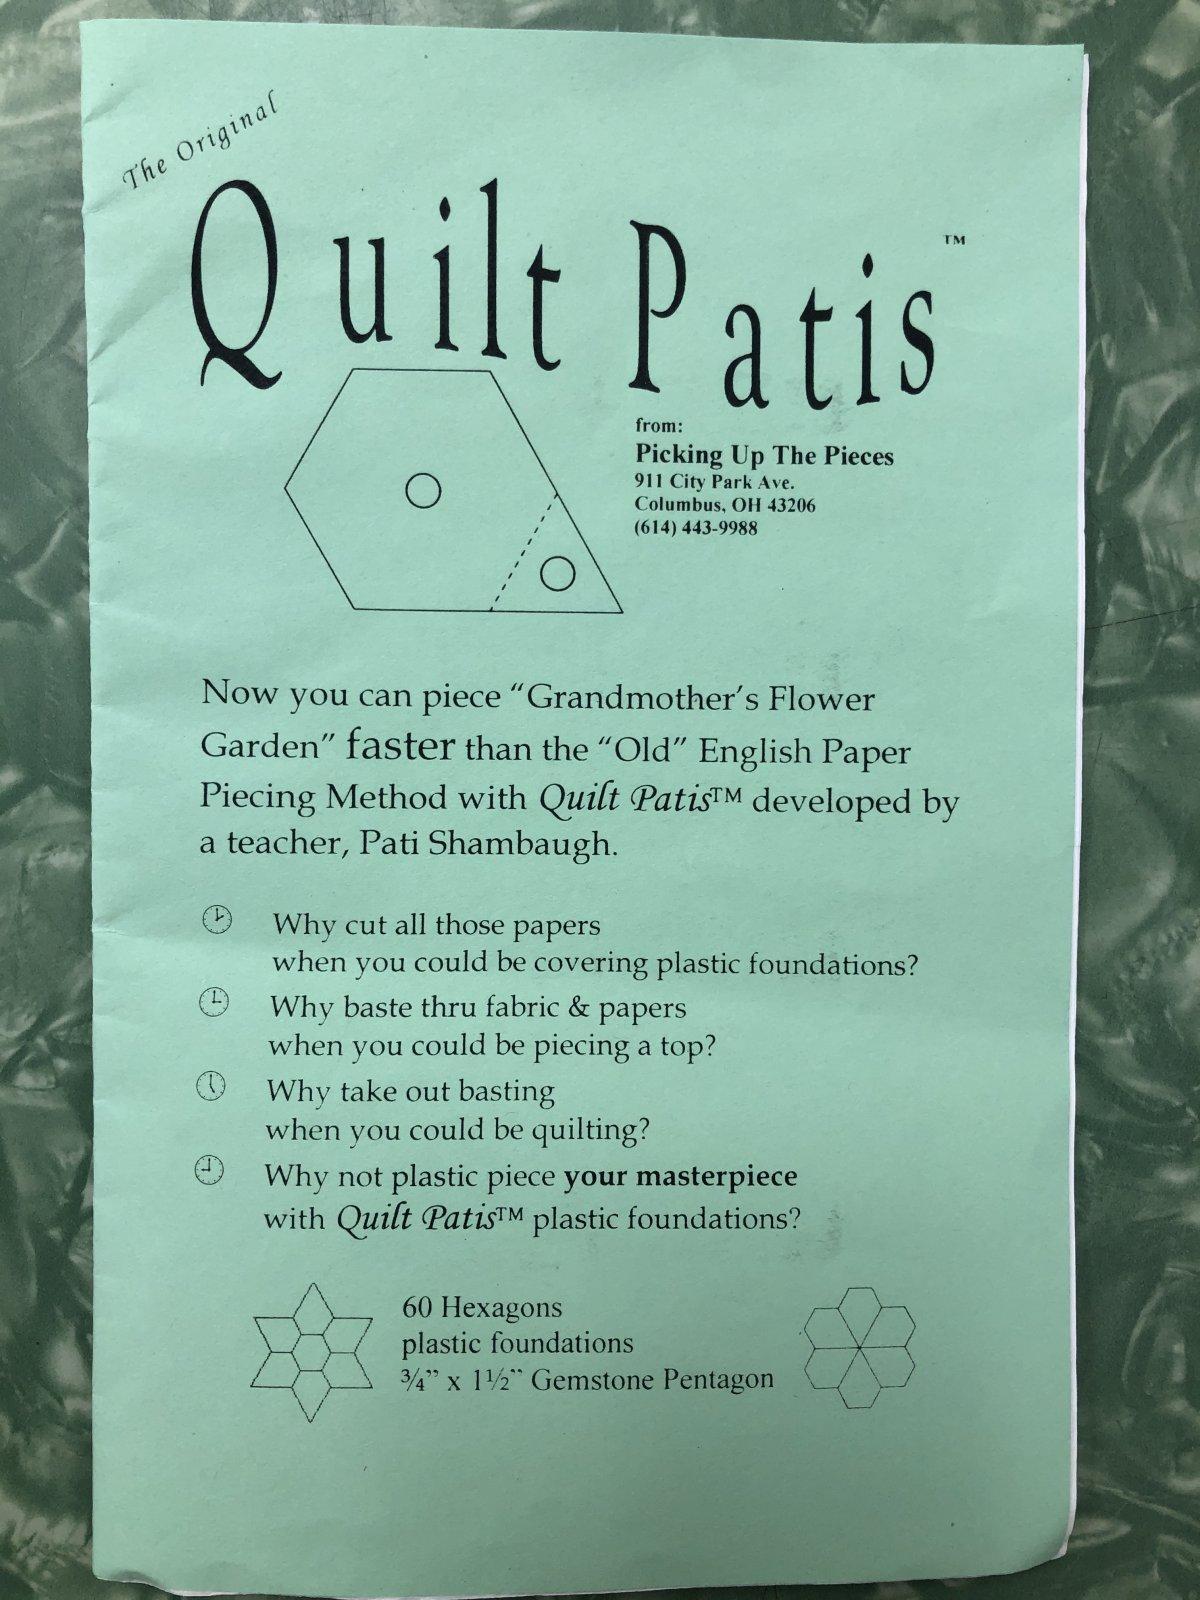 Quilt Patis 3/4 x 1 1/2 Gemstone Pentagon